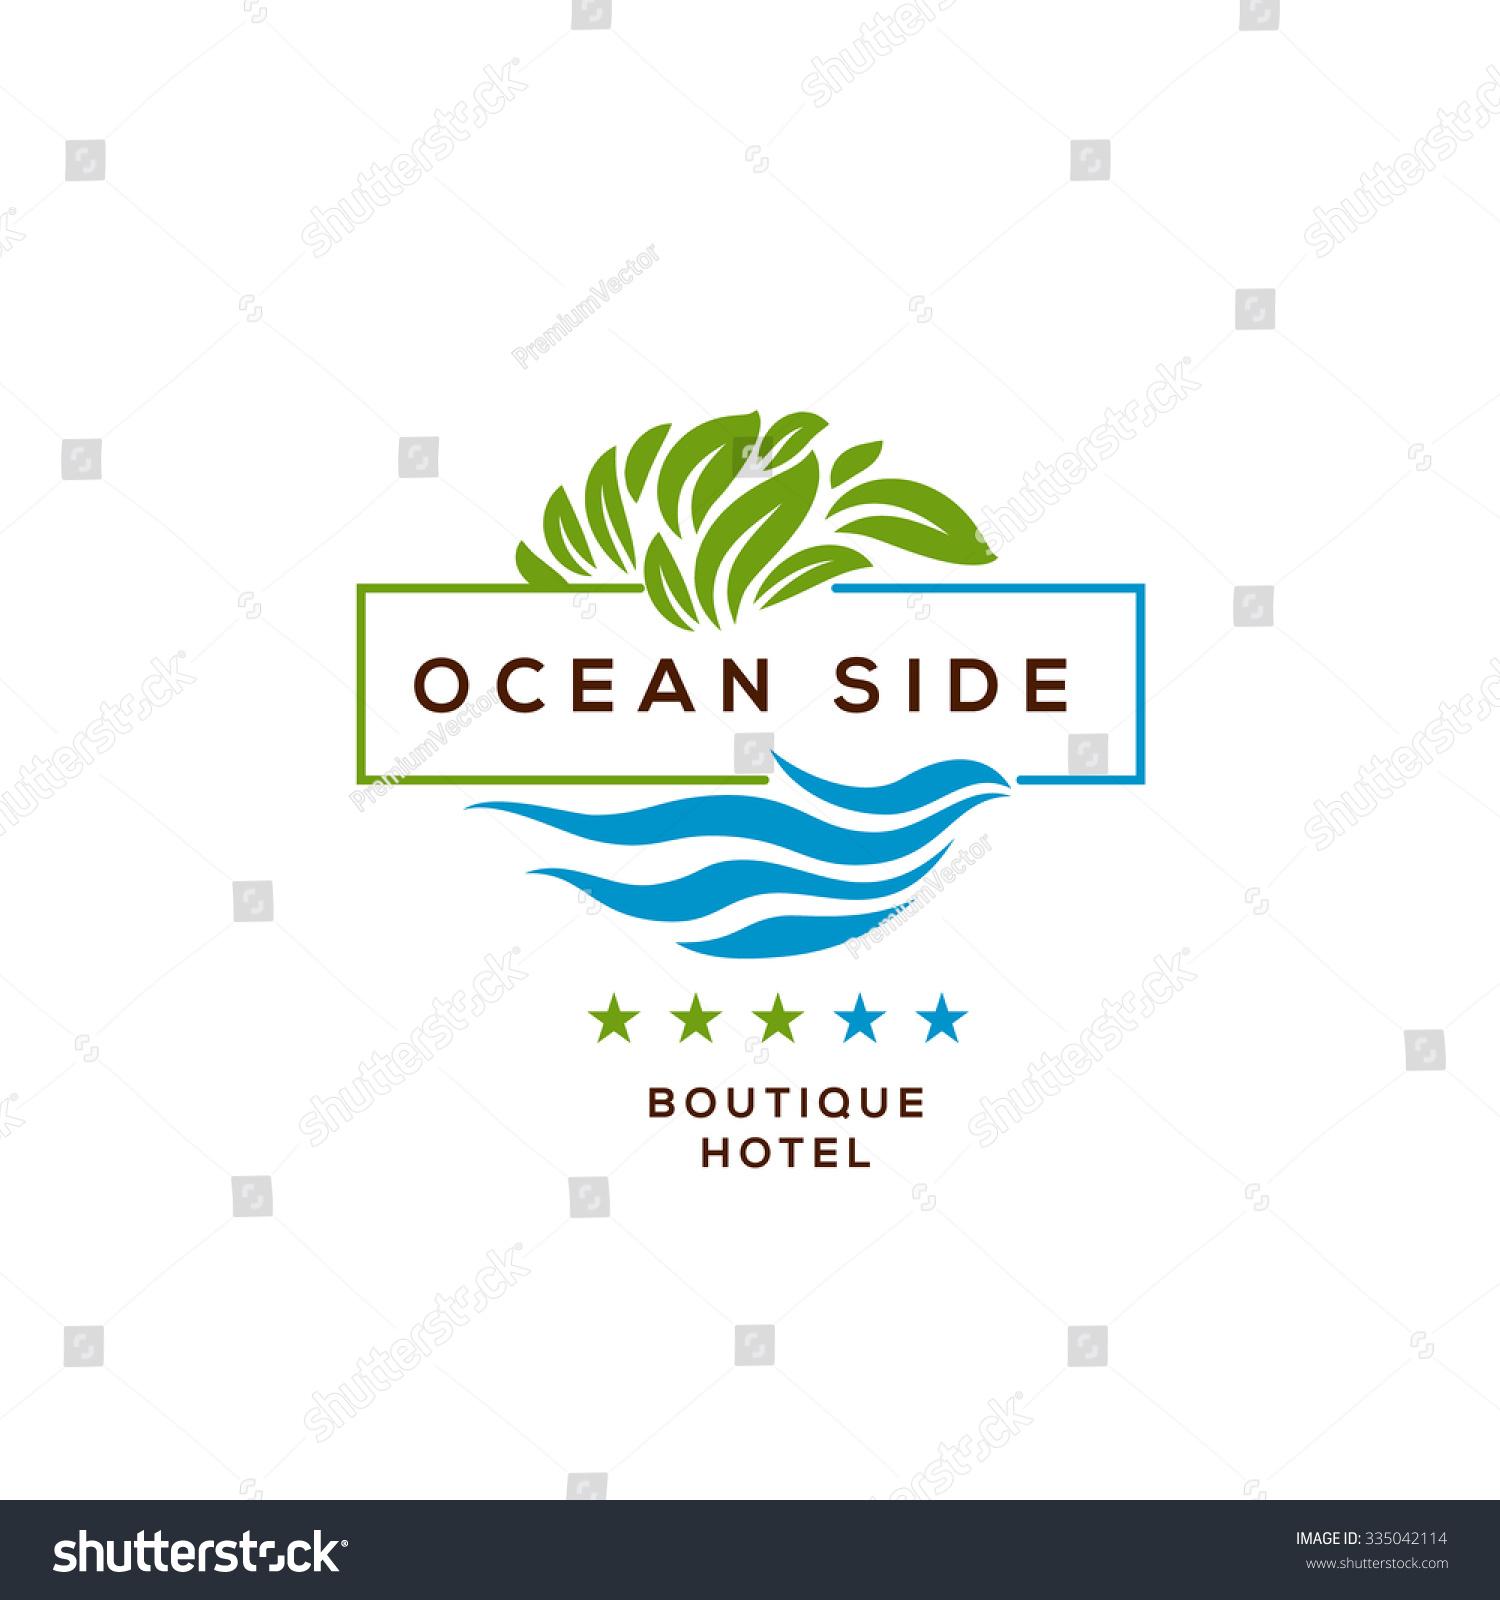 Logo boutique hotel ocean view resort stock vector for Design hotel logo